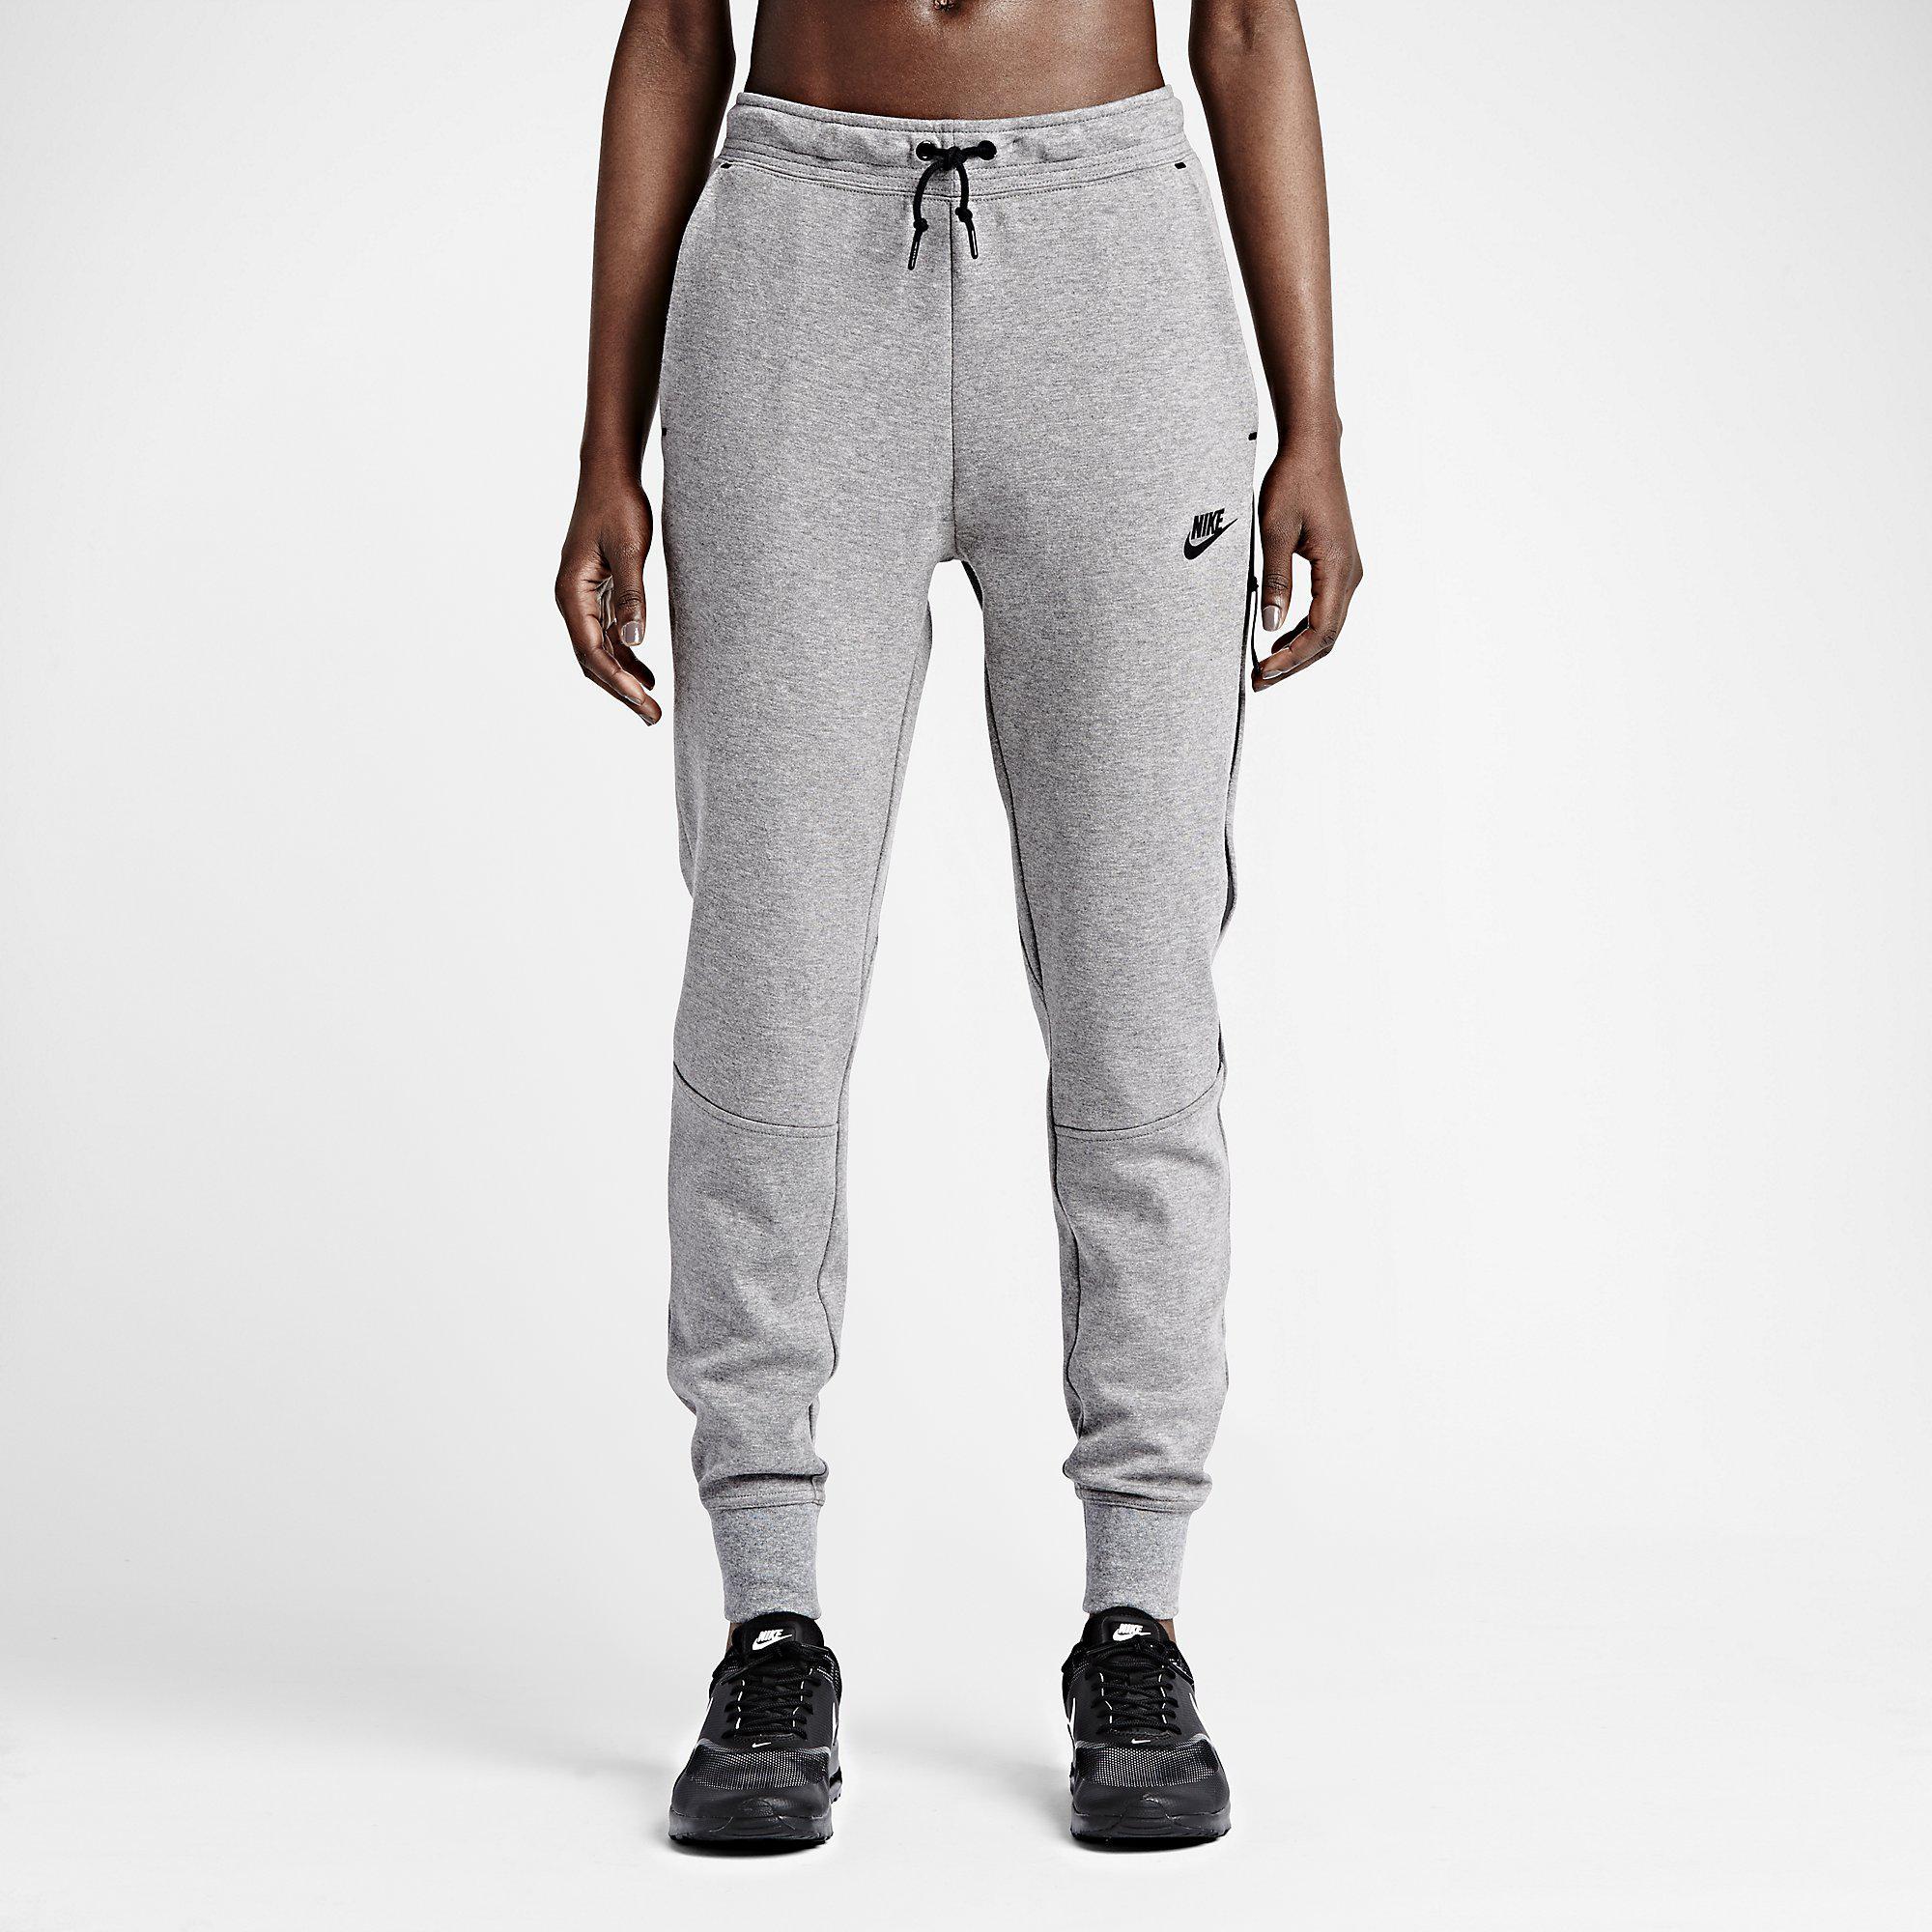 Awesome Fleece Pants Nike Sneakers Women S Pants Nike Tech Pants Nike Tech